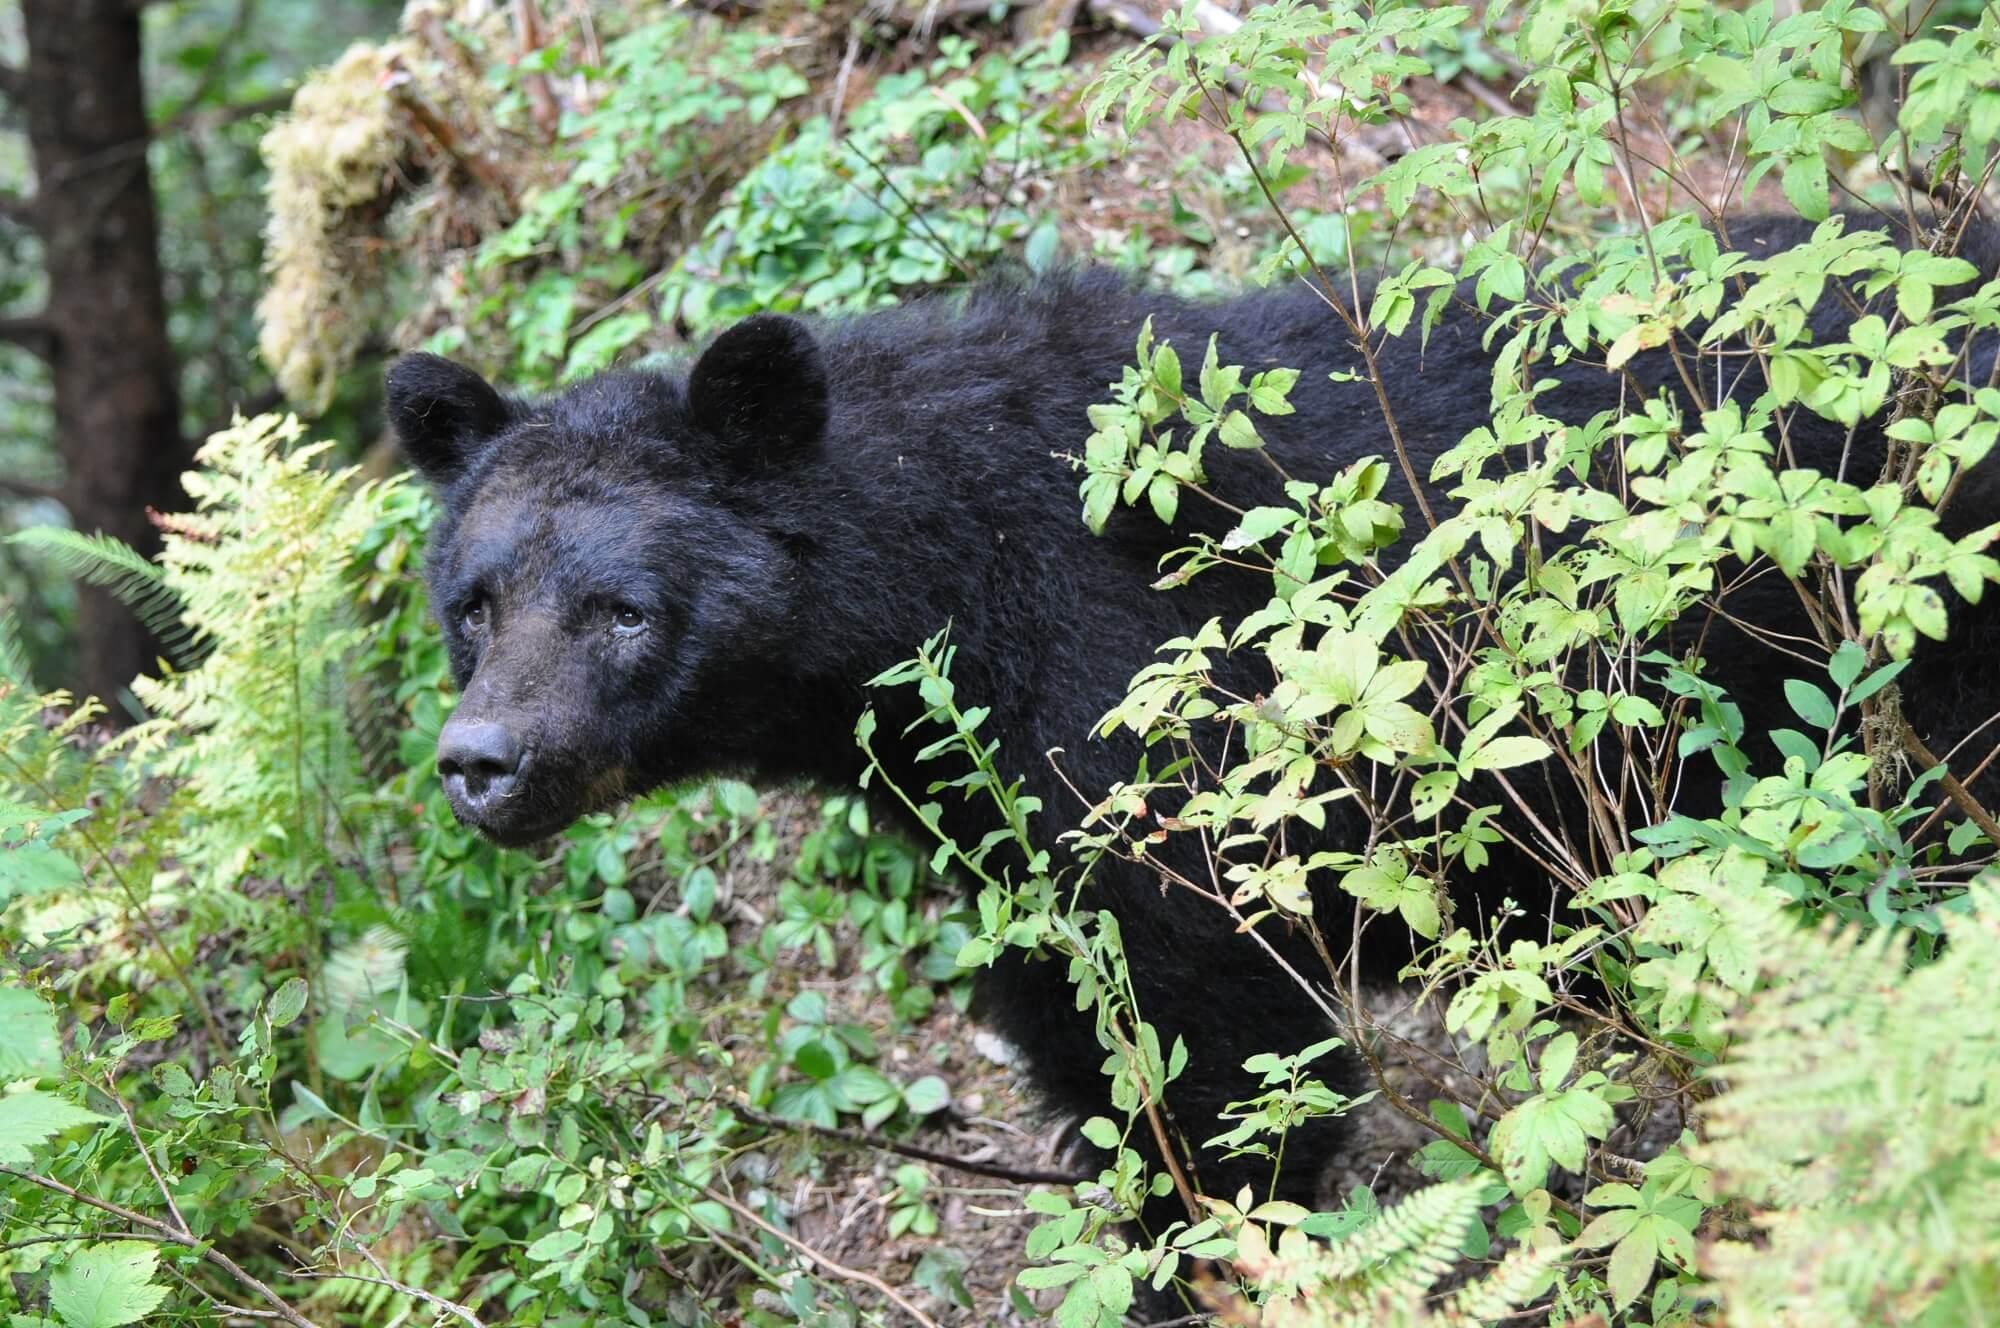 https://www.kawanti.com/wp-content/uploads/2018/10/Alaska-Bear-Black-Bear-in-vegetation.jpg